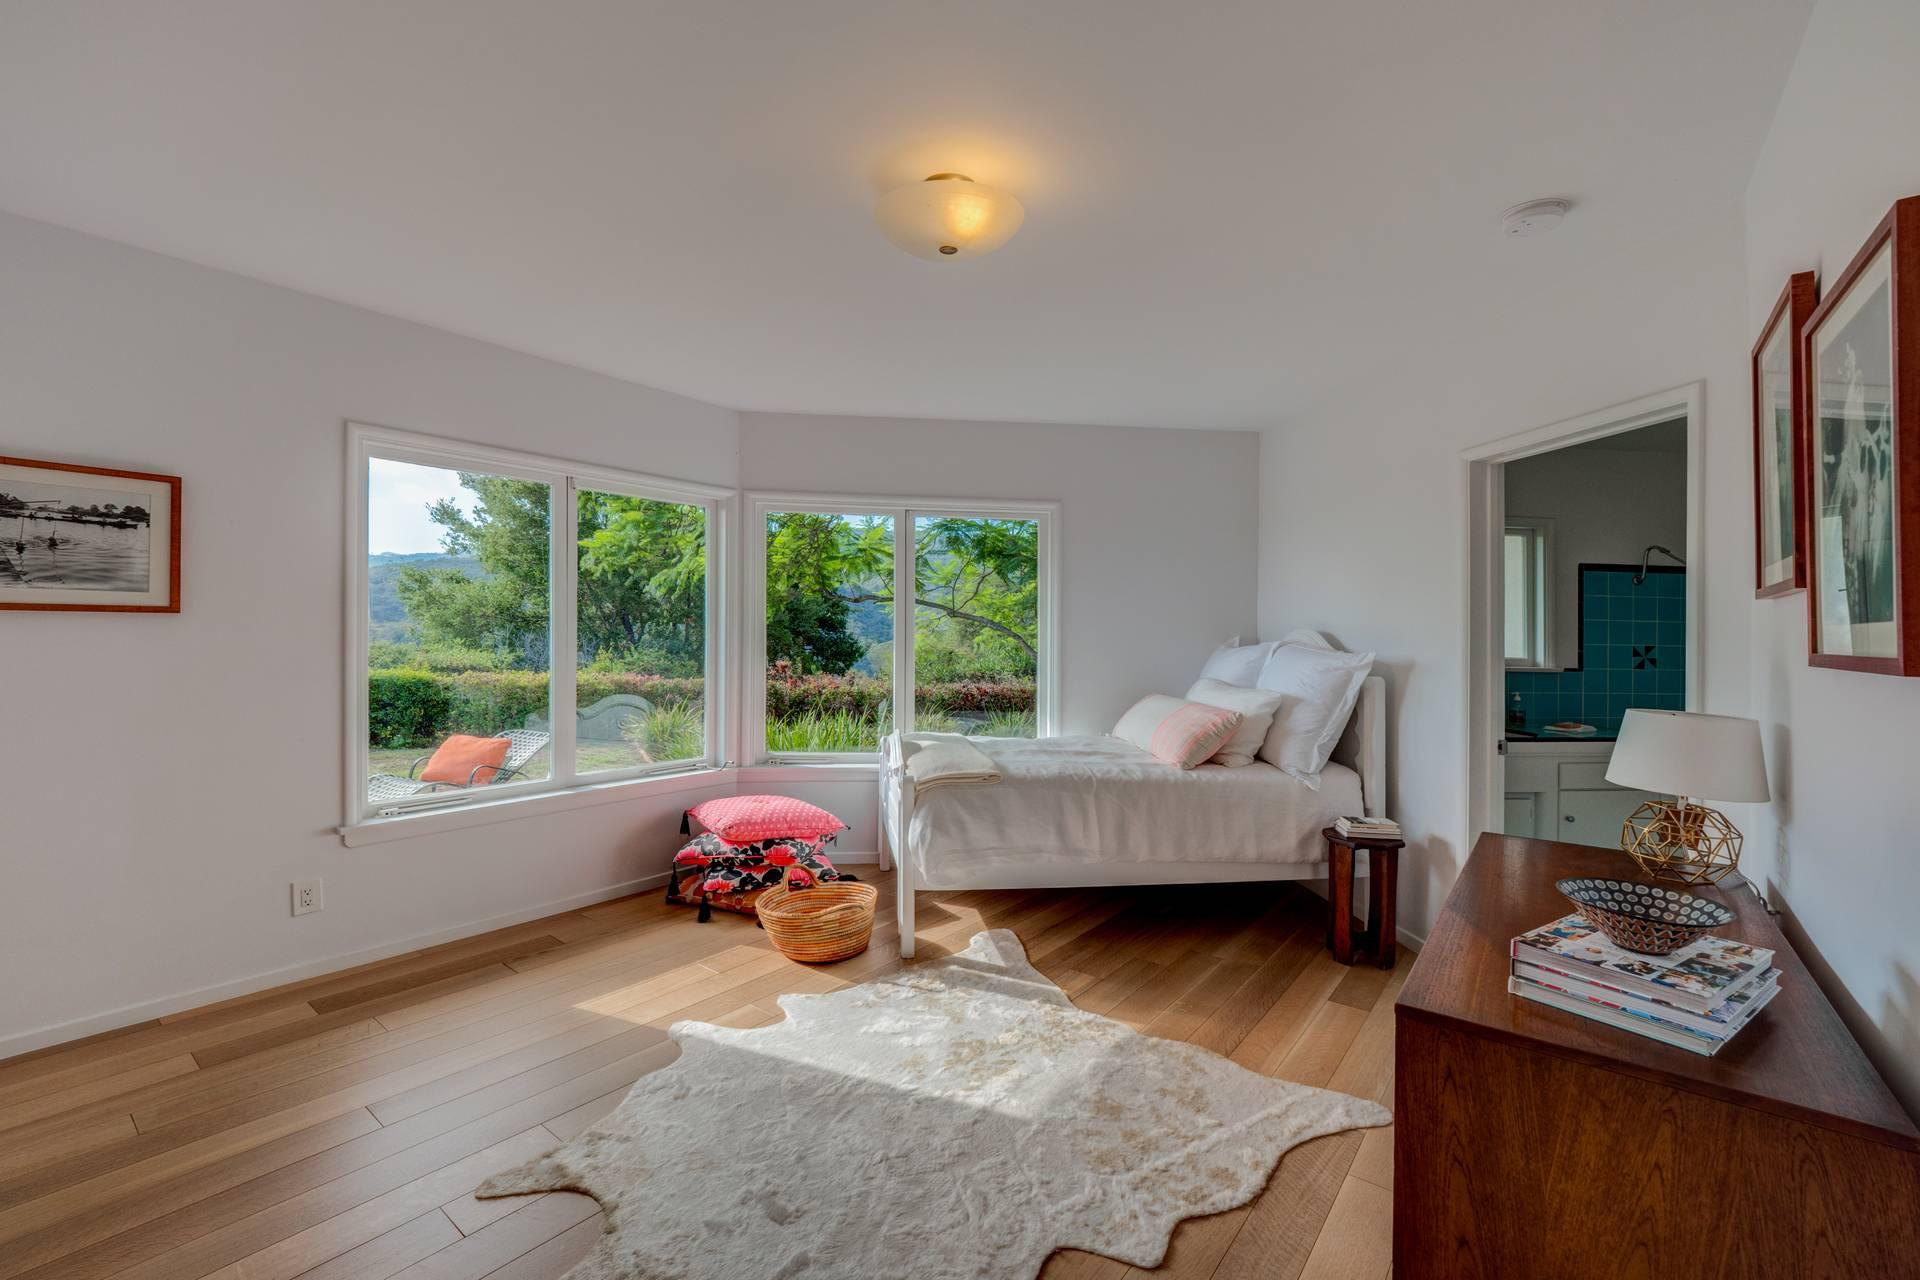 1290 Rimmer,Pacific Palisades,California 90272,3 Bedrooms Bedrooms,3 BathroomsBathrooms,Home,Rimmer,1060